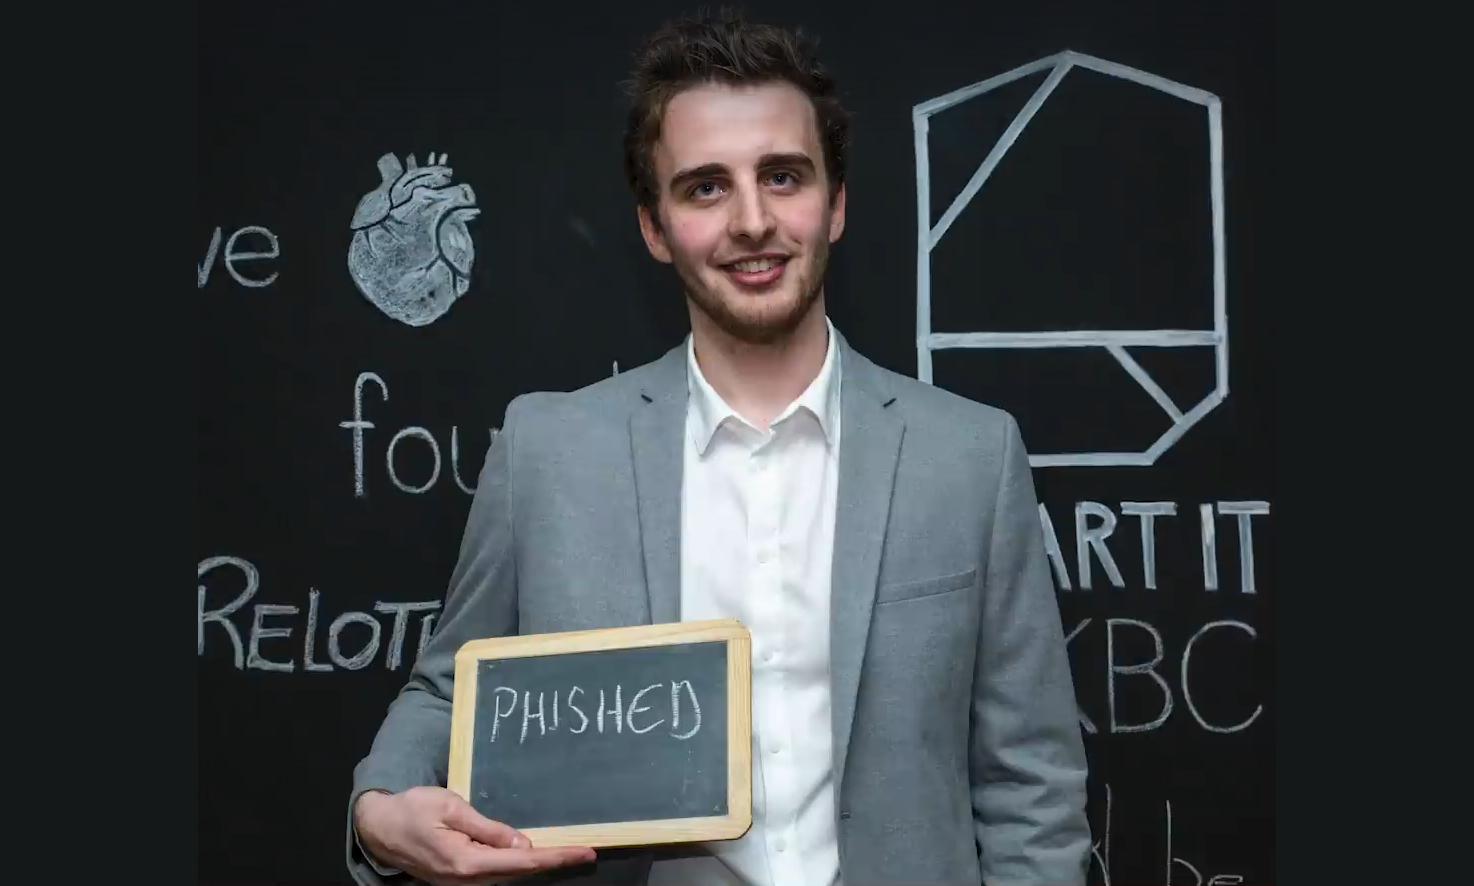 Phished-founder Arnout Van de Meulebroucke., Phished